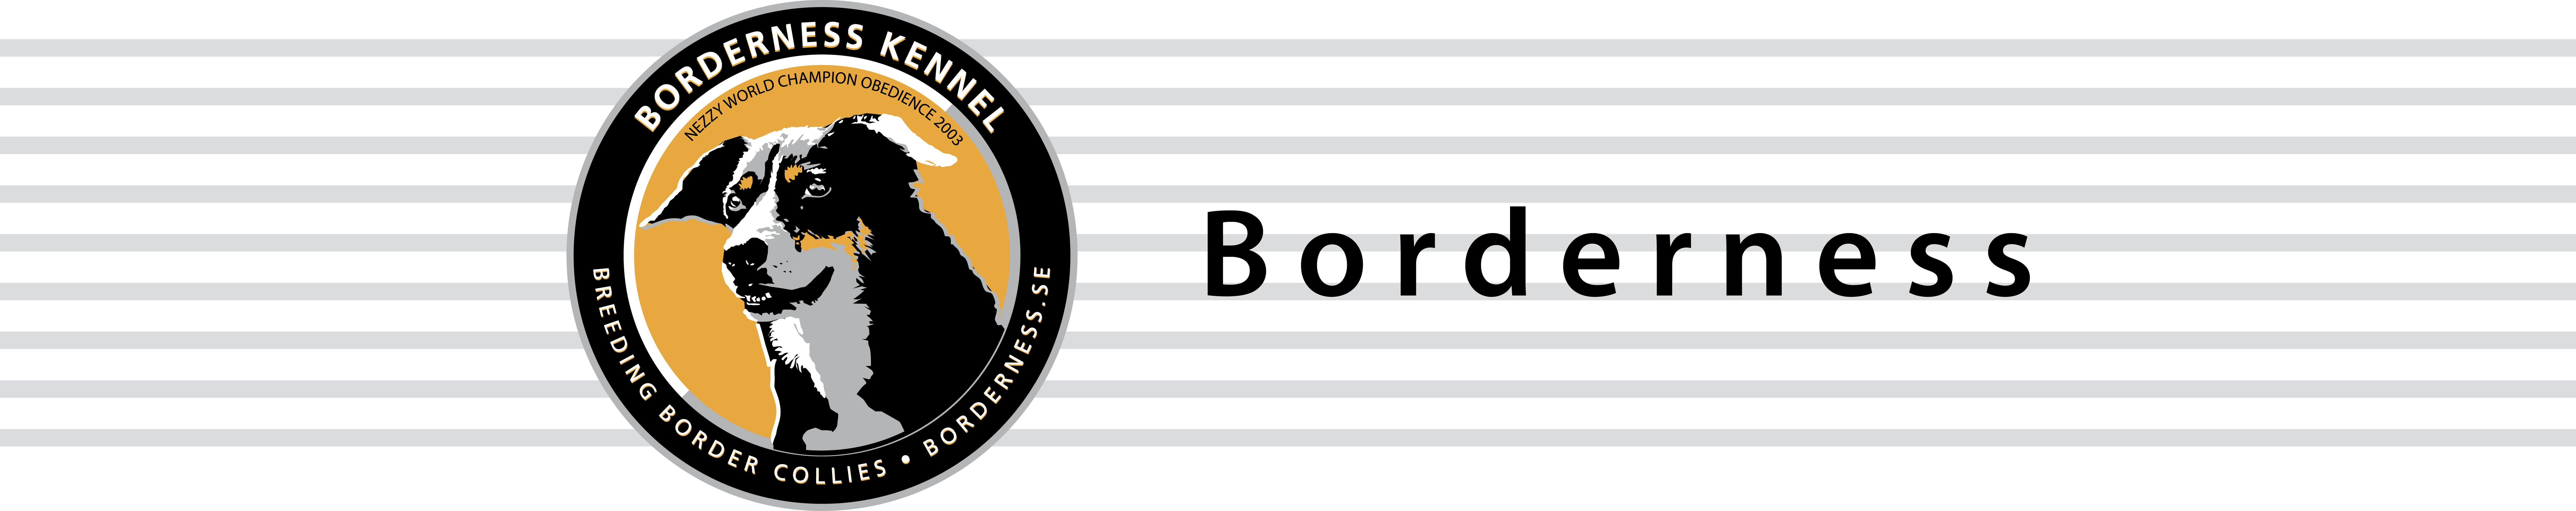 borderness_logo2